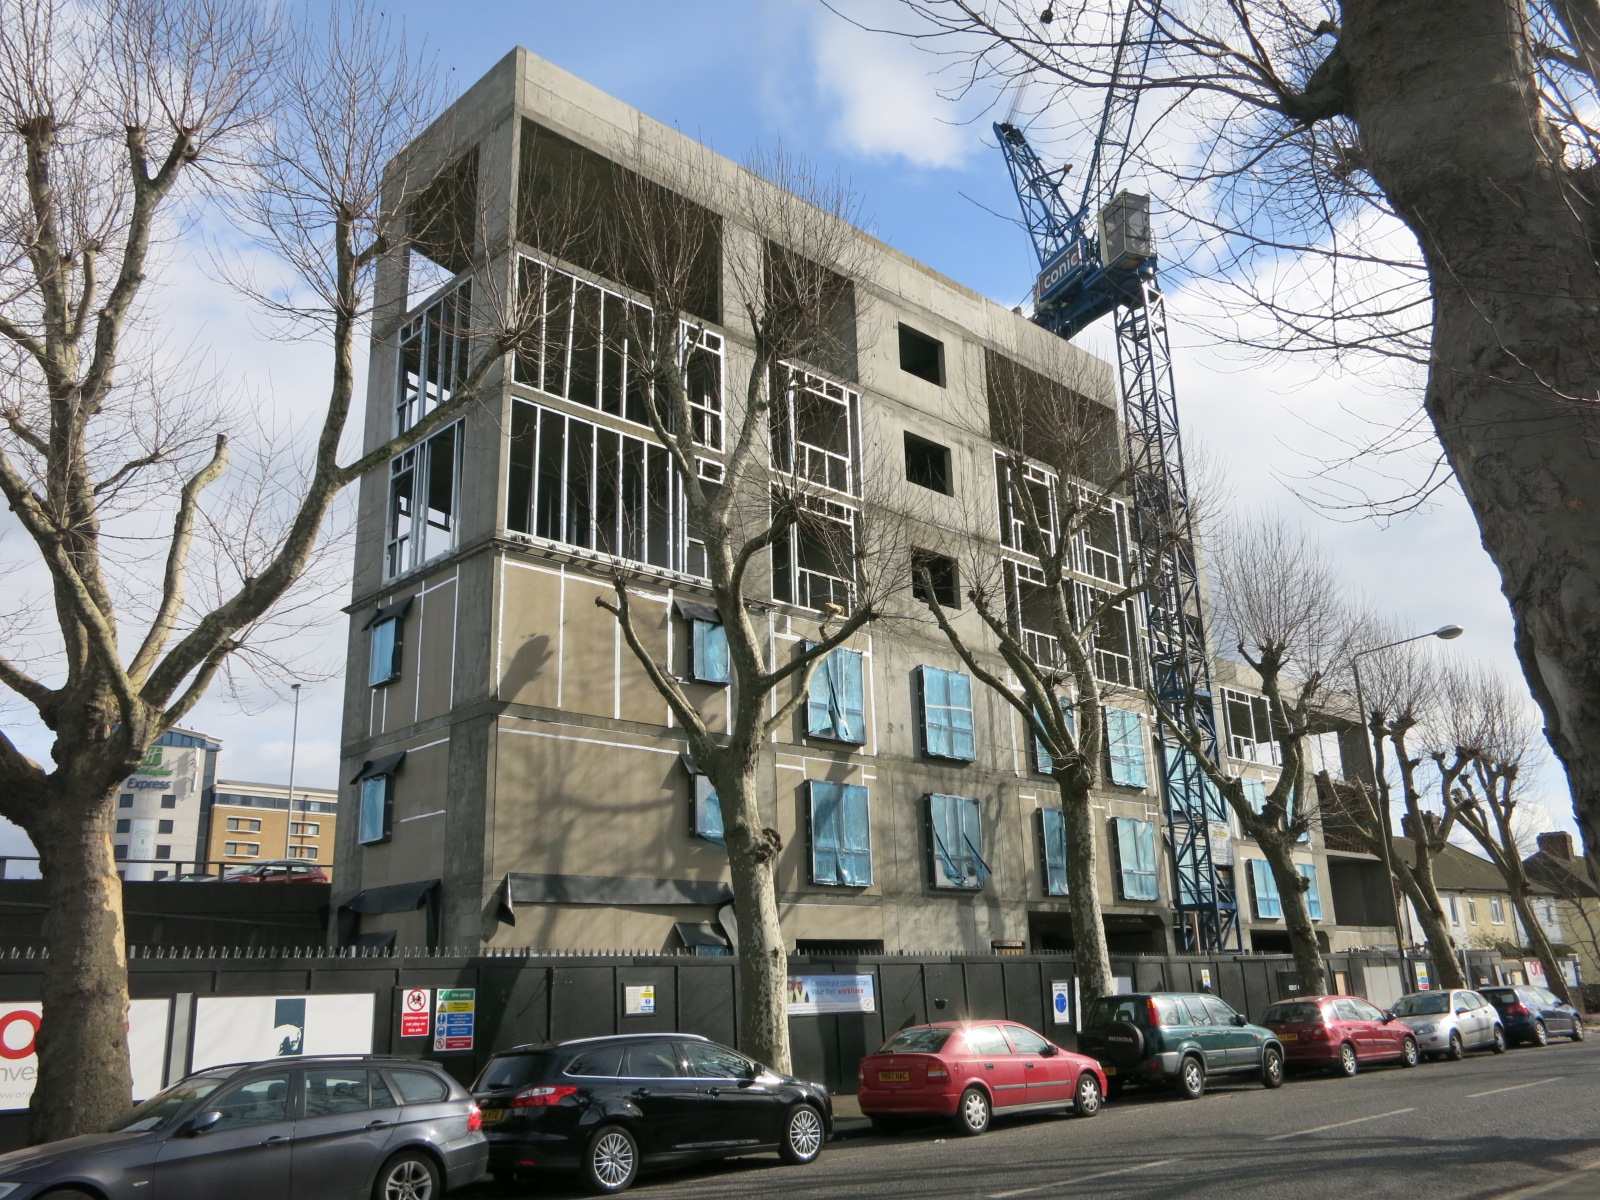 Construction progress - March 2016 [greenpenlondon]